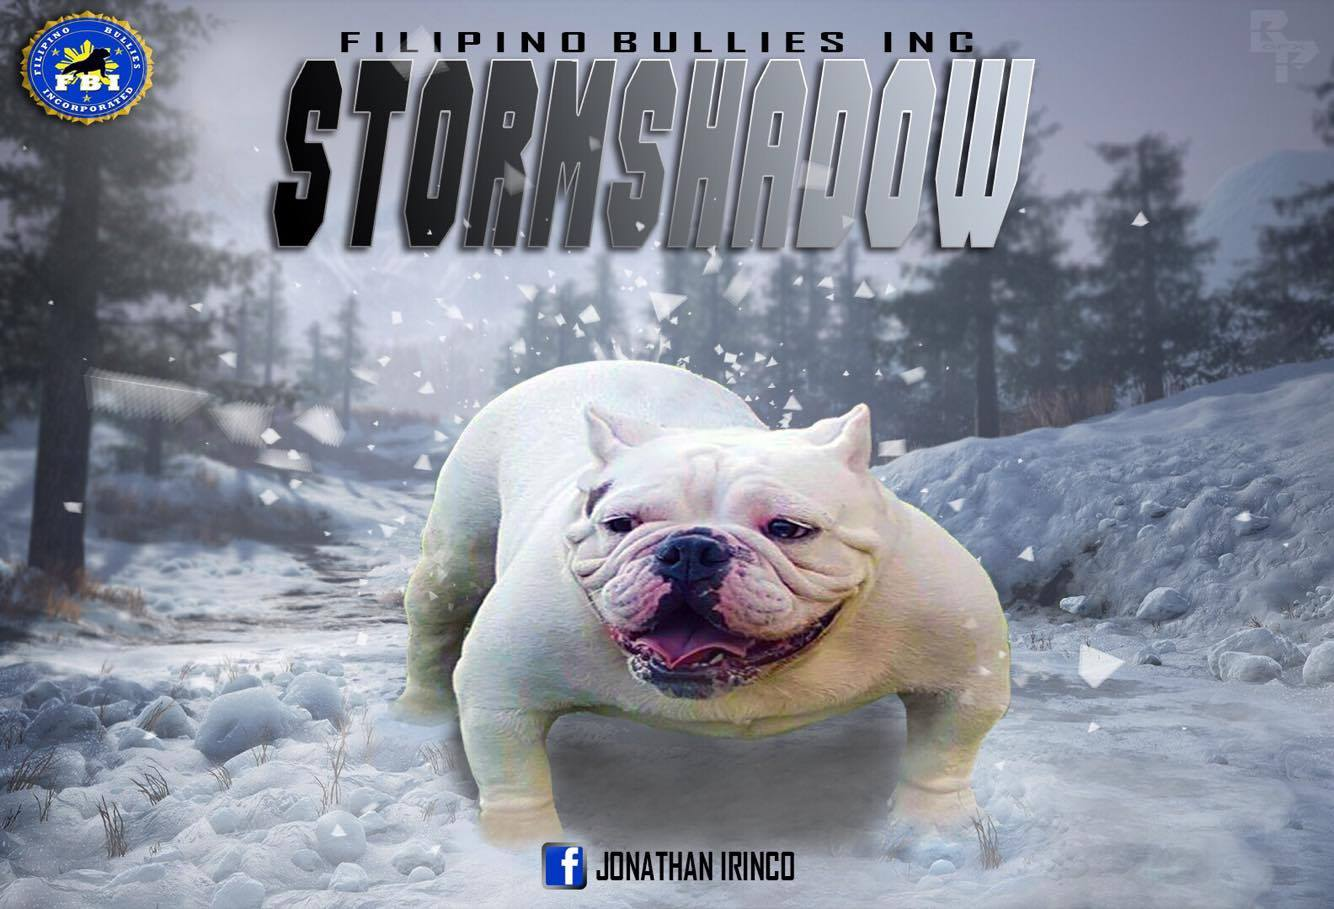 Filipino Bullies Inc - Storm shadow